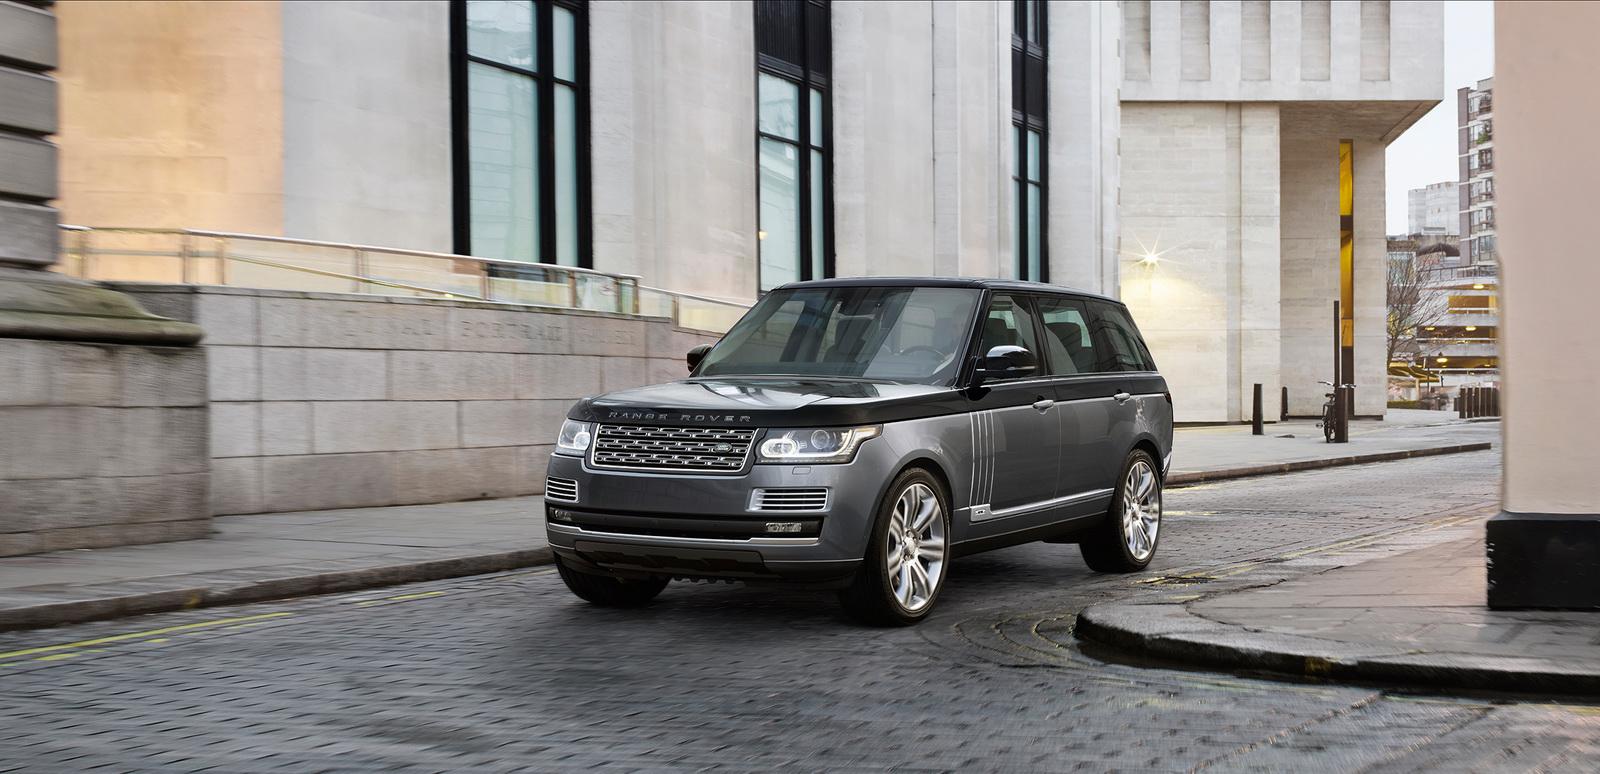 Range-Rover-SVAutobiography-1